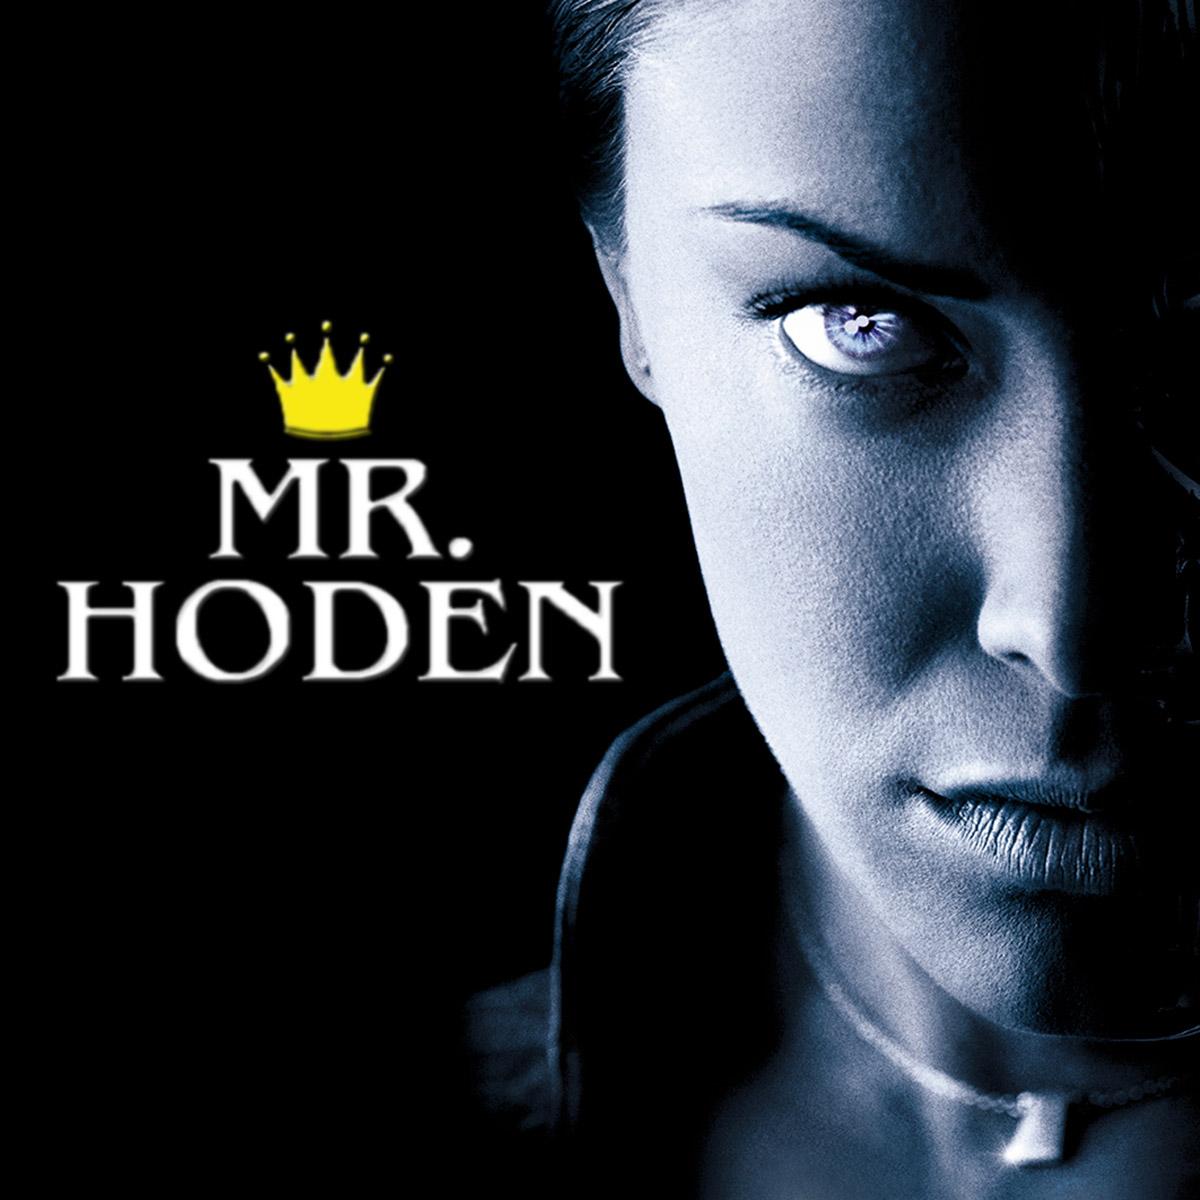 Upcoming: Mr. Hoden - Smooth Dark Hip Hop Beat 2018 (Free Beat)